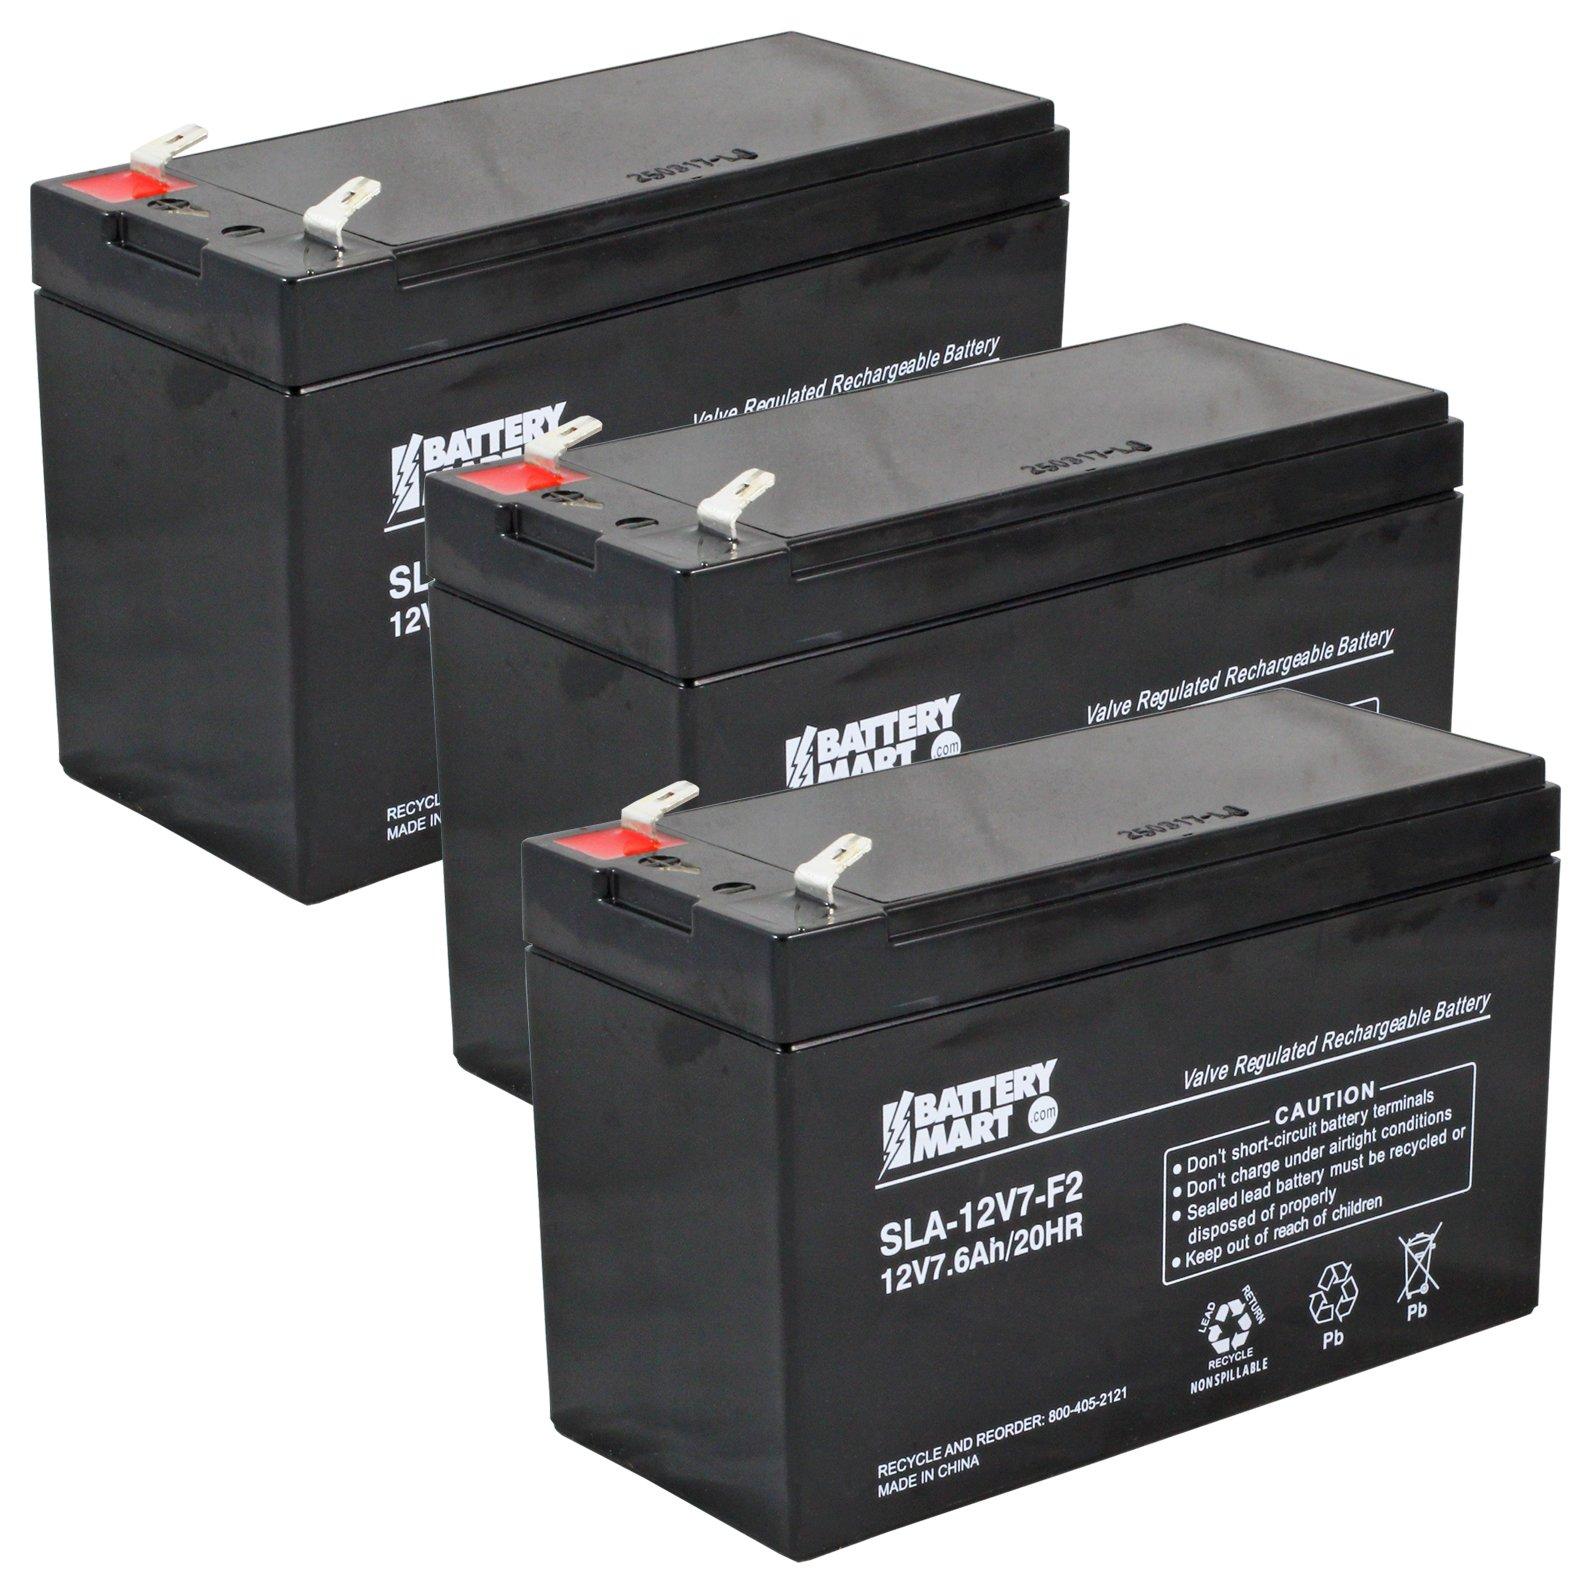 [3 Pack] 12 Volt 7 6 Ah Sealed Lead Acid Rechargeable Batteries - F2  Terminal